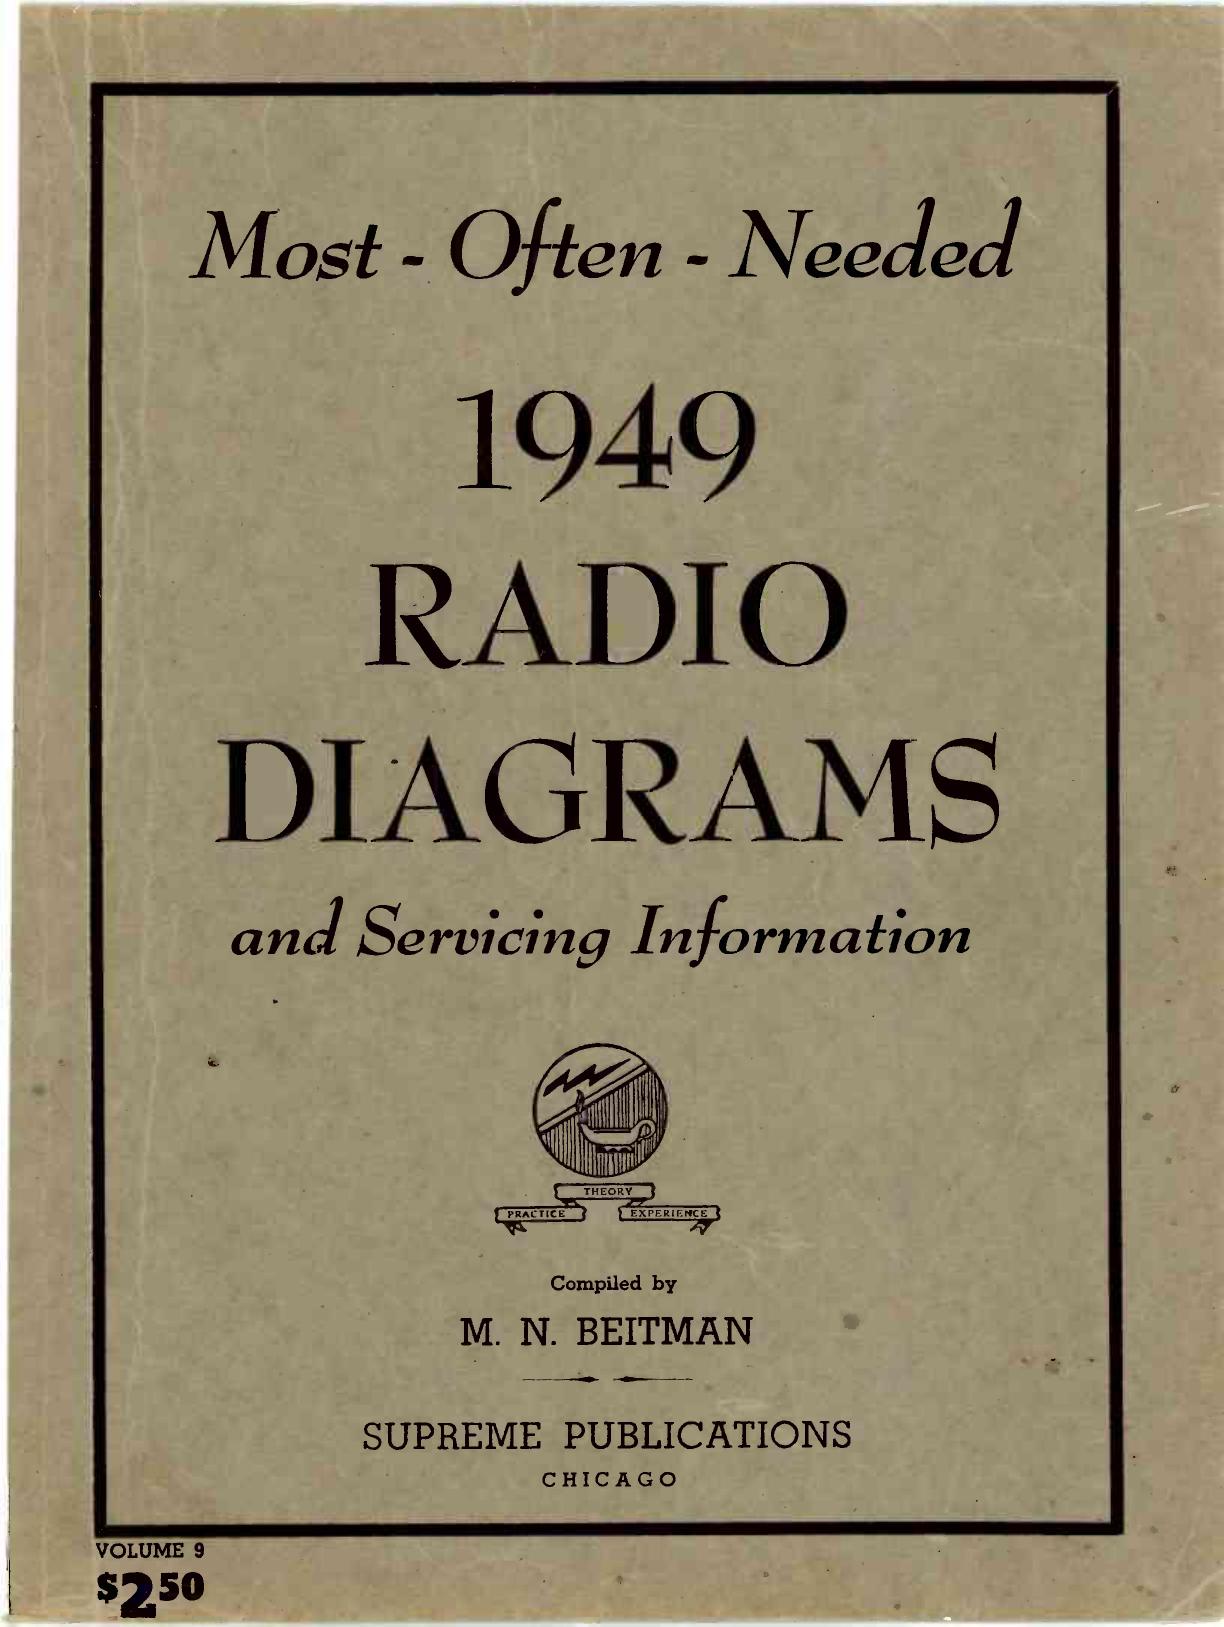 Most Often Needed American Radio History Sennheiser Cl1 Wiring Diagram